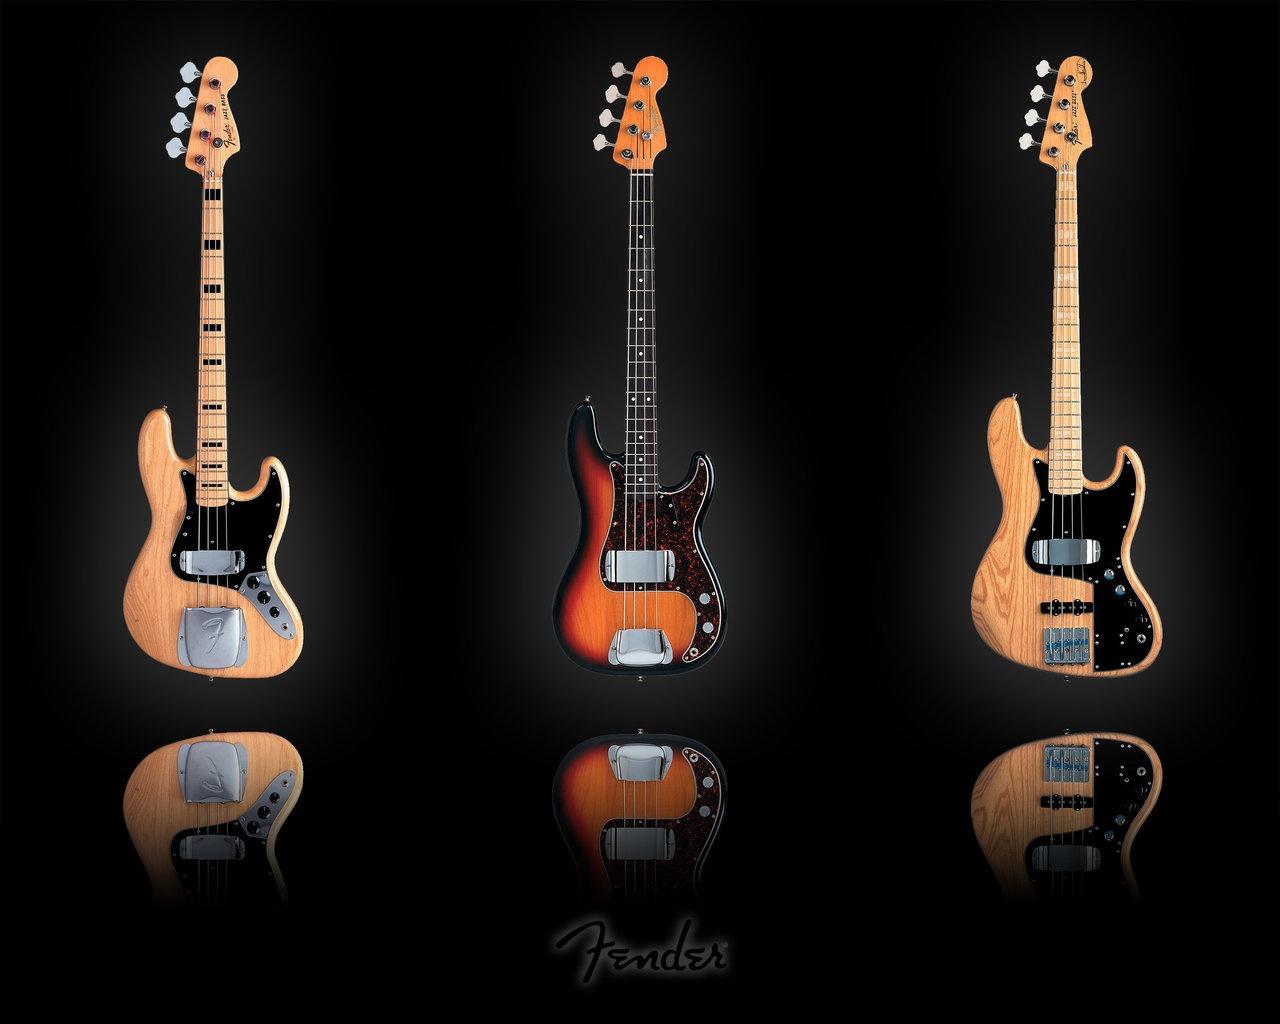 Bass Guitar Wallpapers For Desktop 2543 Hd Wallpapers in Music 1280x1024